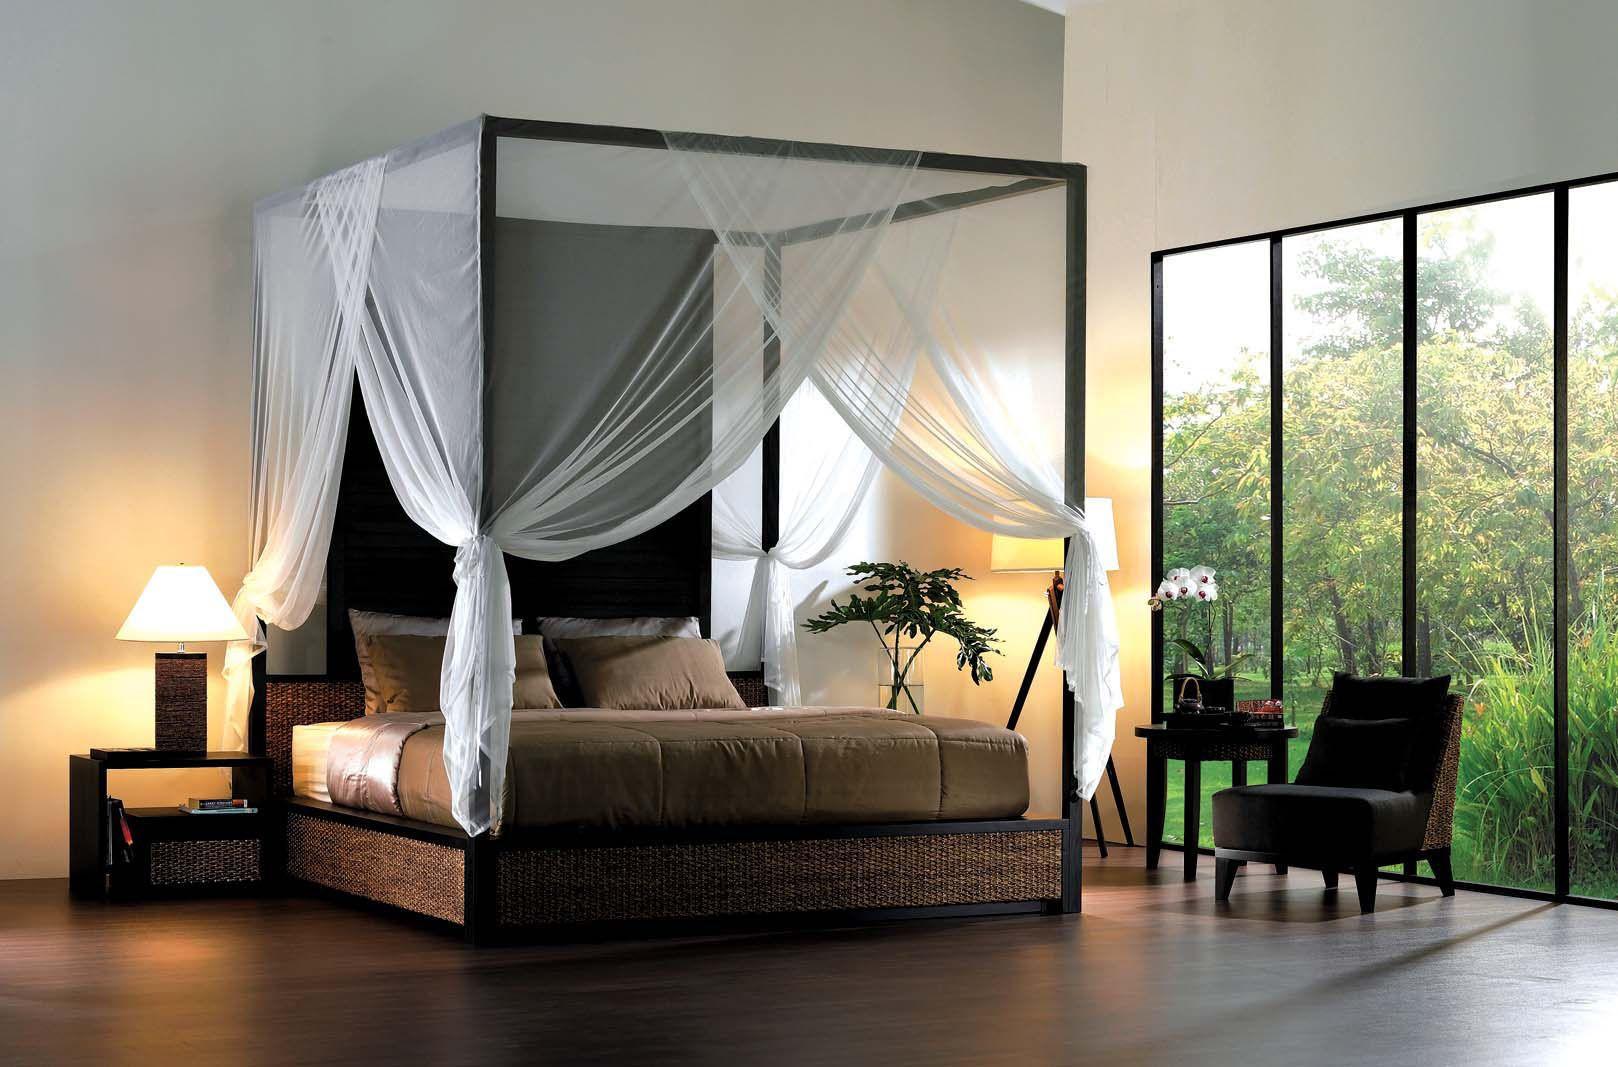 Sweet Dreams Dreamy Canopy Beds Canopy Bedroom Sets Modern